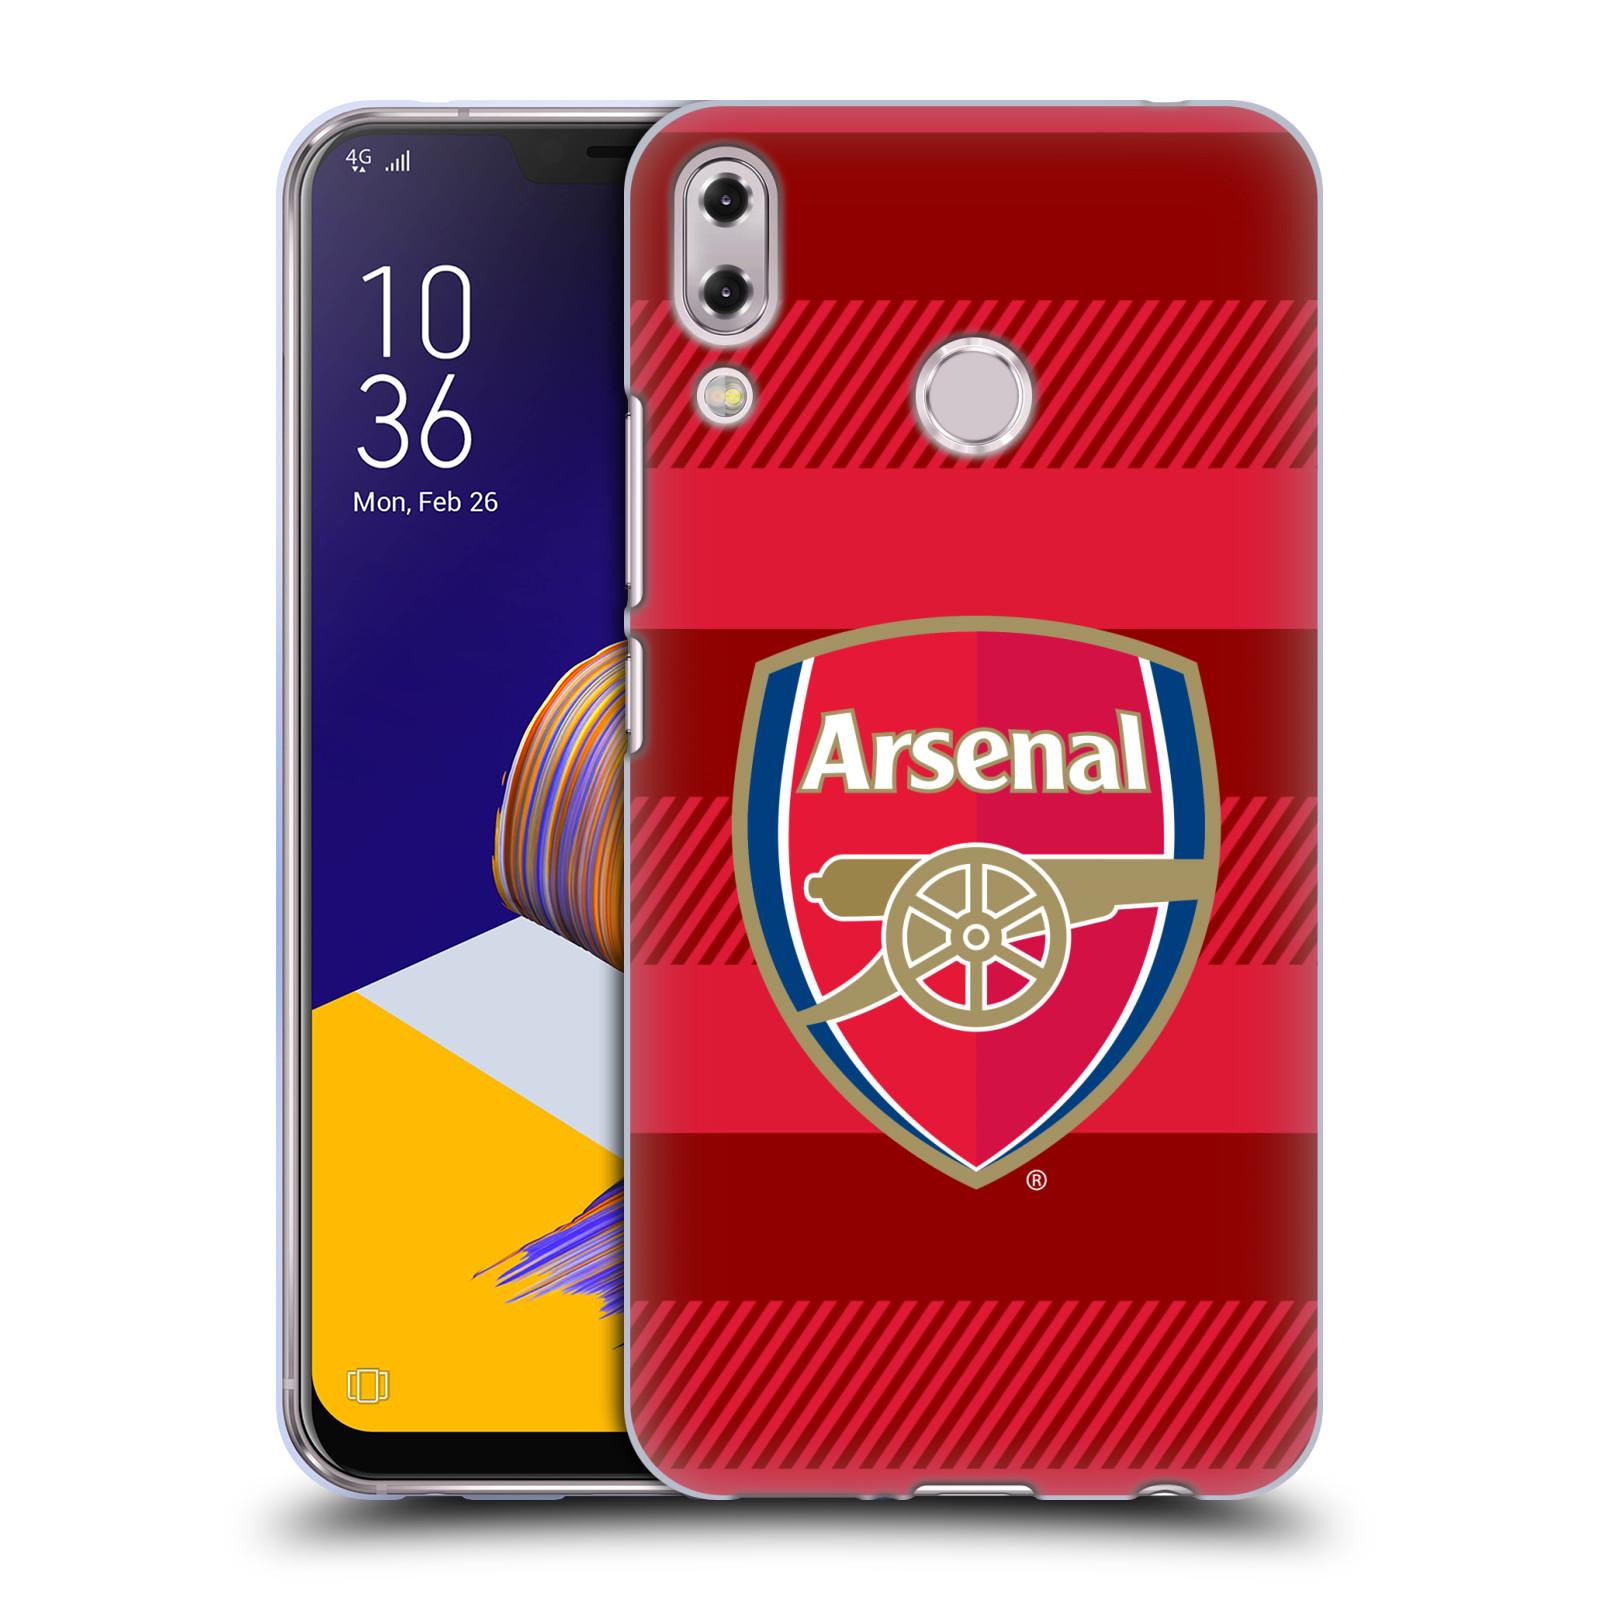 Silikonové pouzdro na mobil Asus ZenFone 5 ZE620KL - Head Case - Arsenal FC - Logo s pruhy